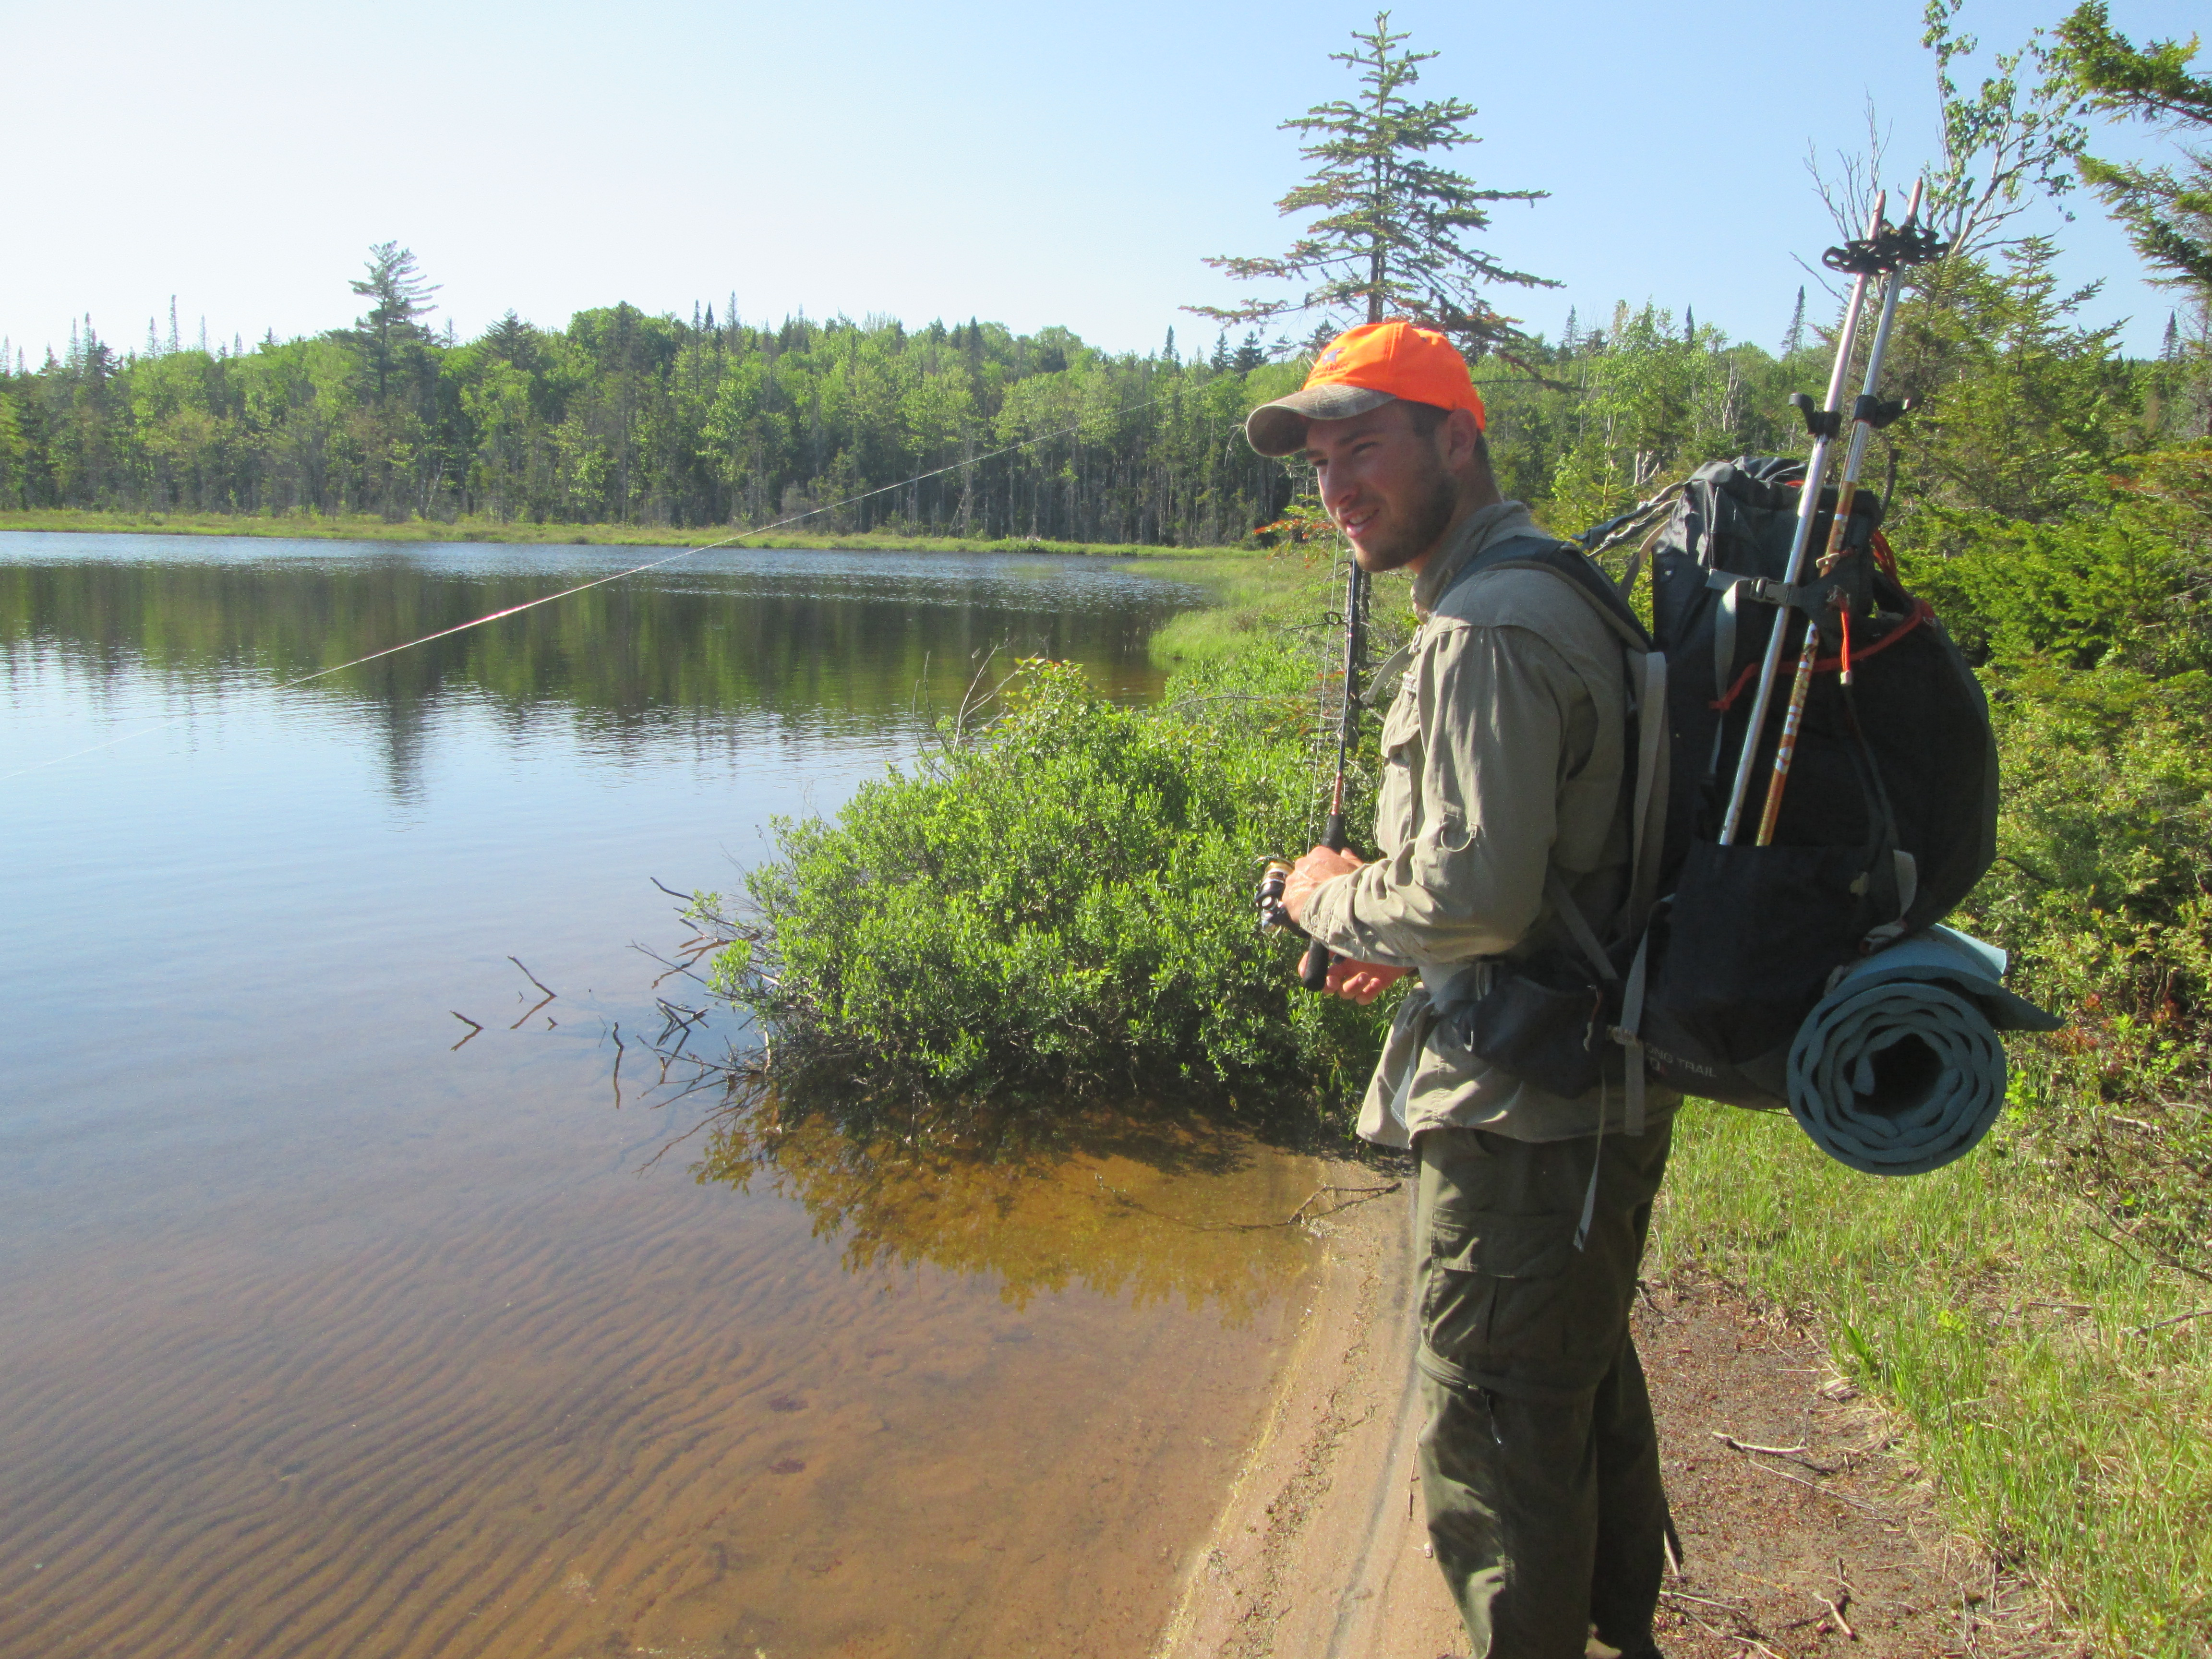 Fishing at West Canada Lakes